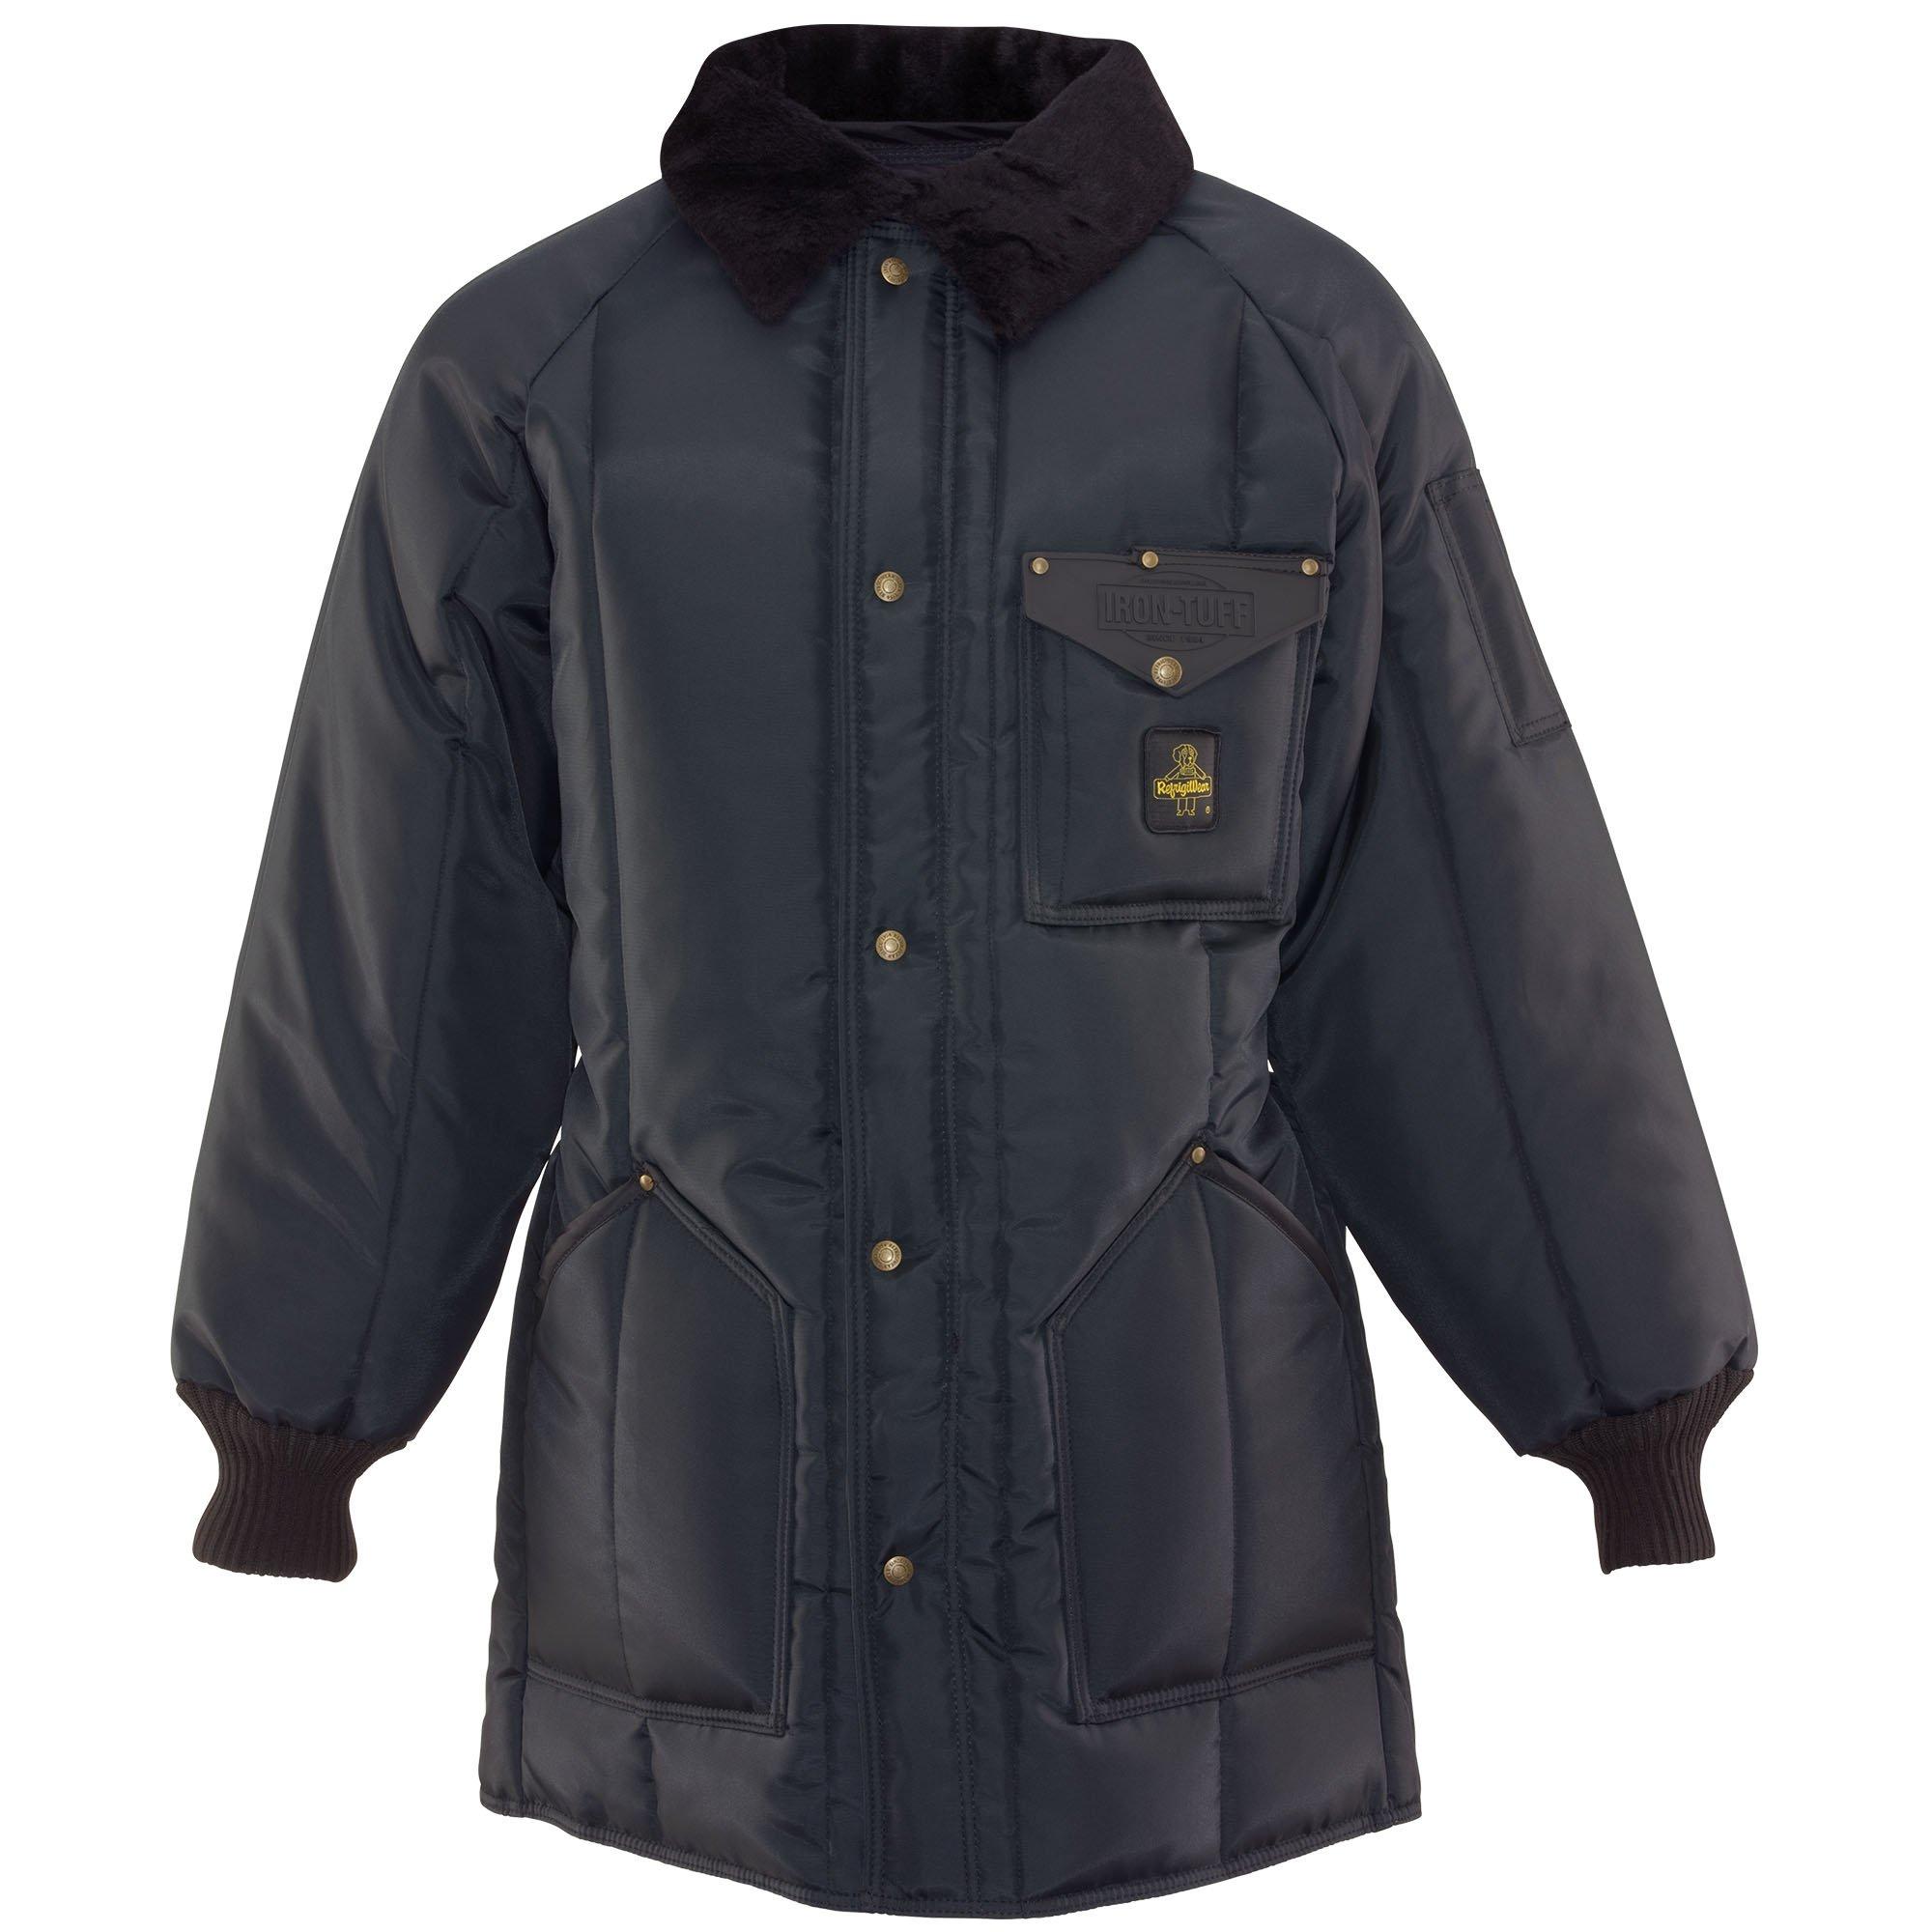 RefrigiWear Men's Winterseal Deep Freeze Work Jacket, Navy 4XL